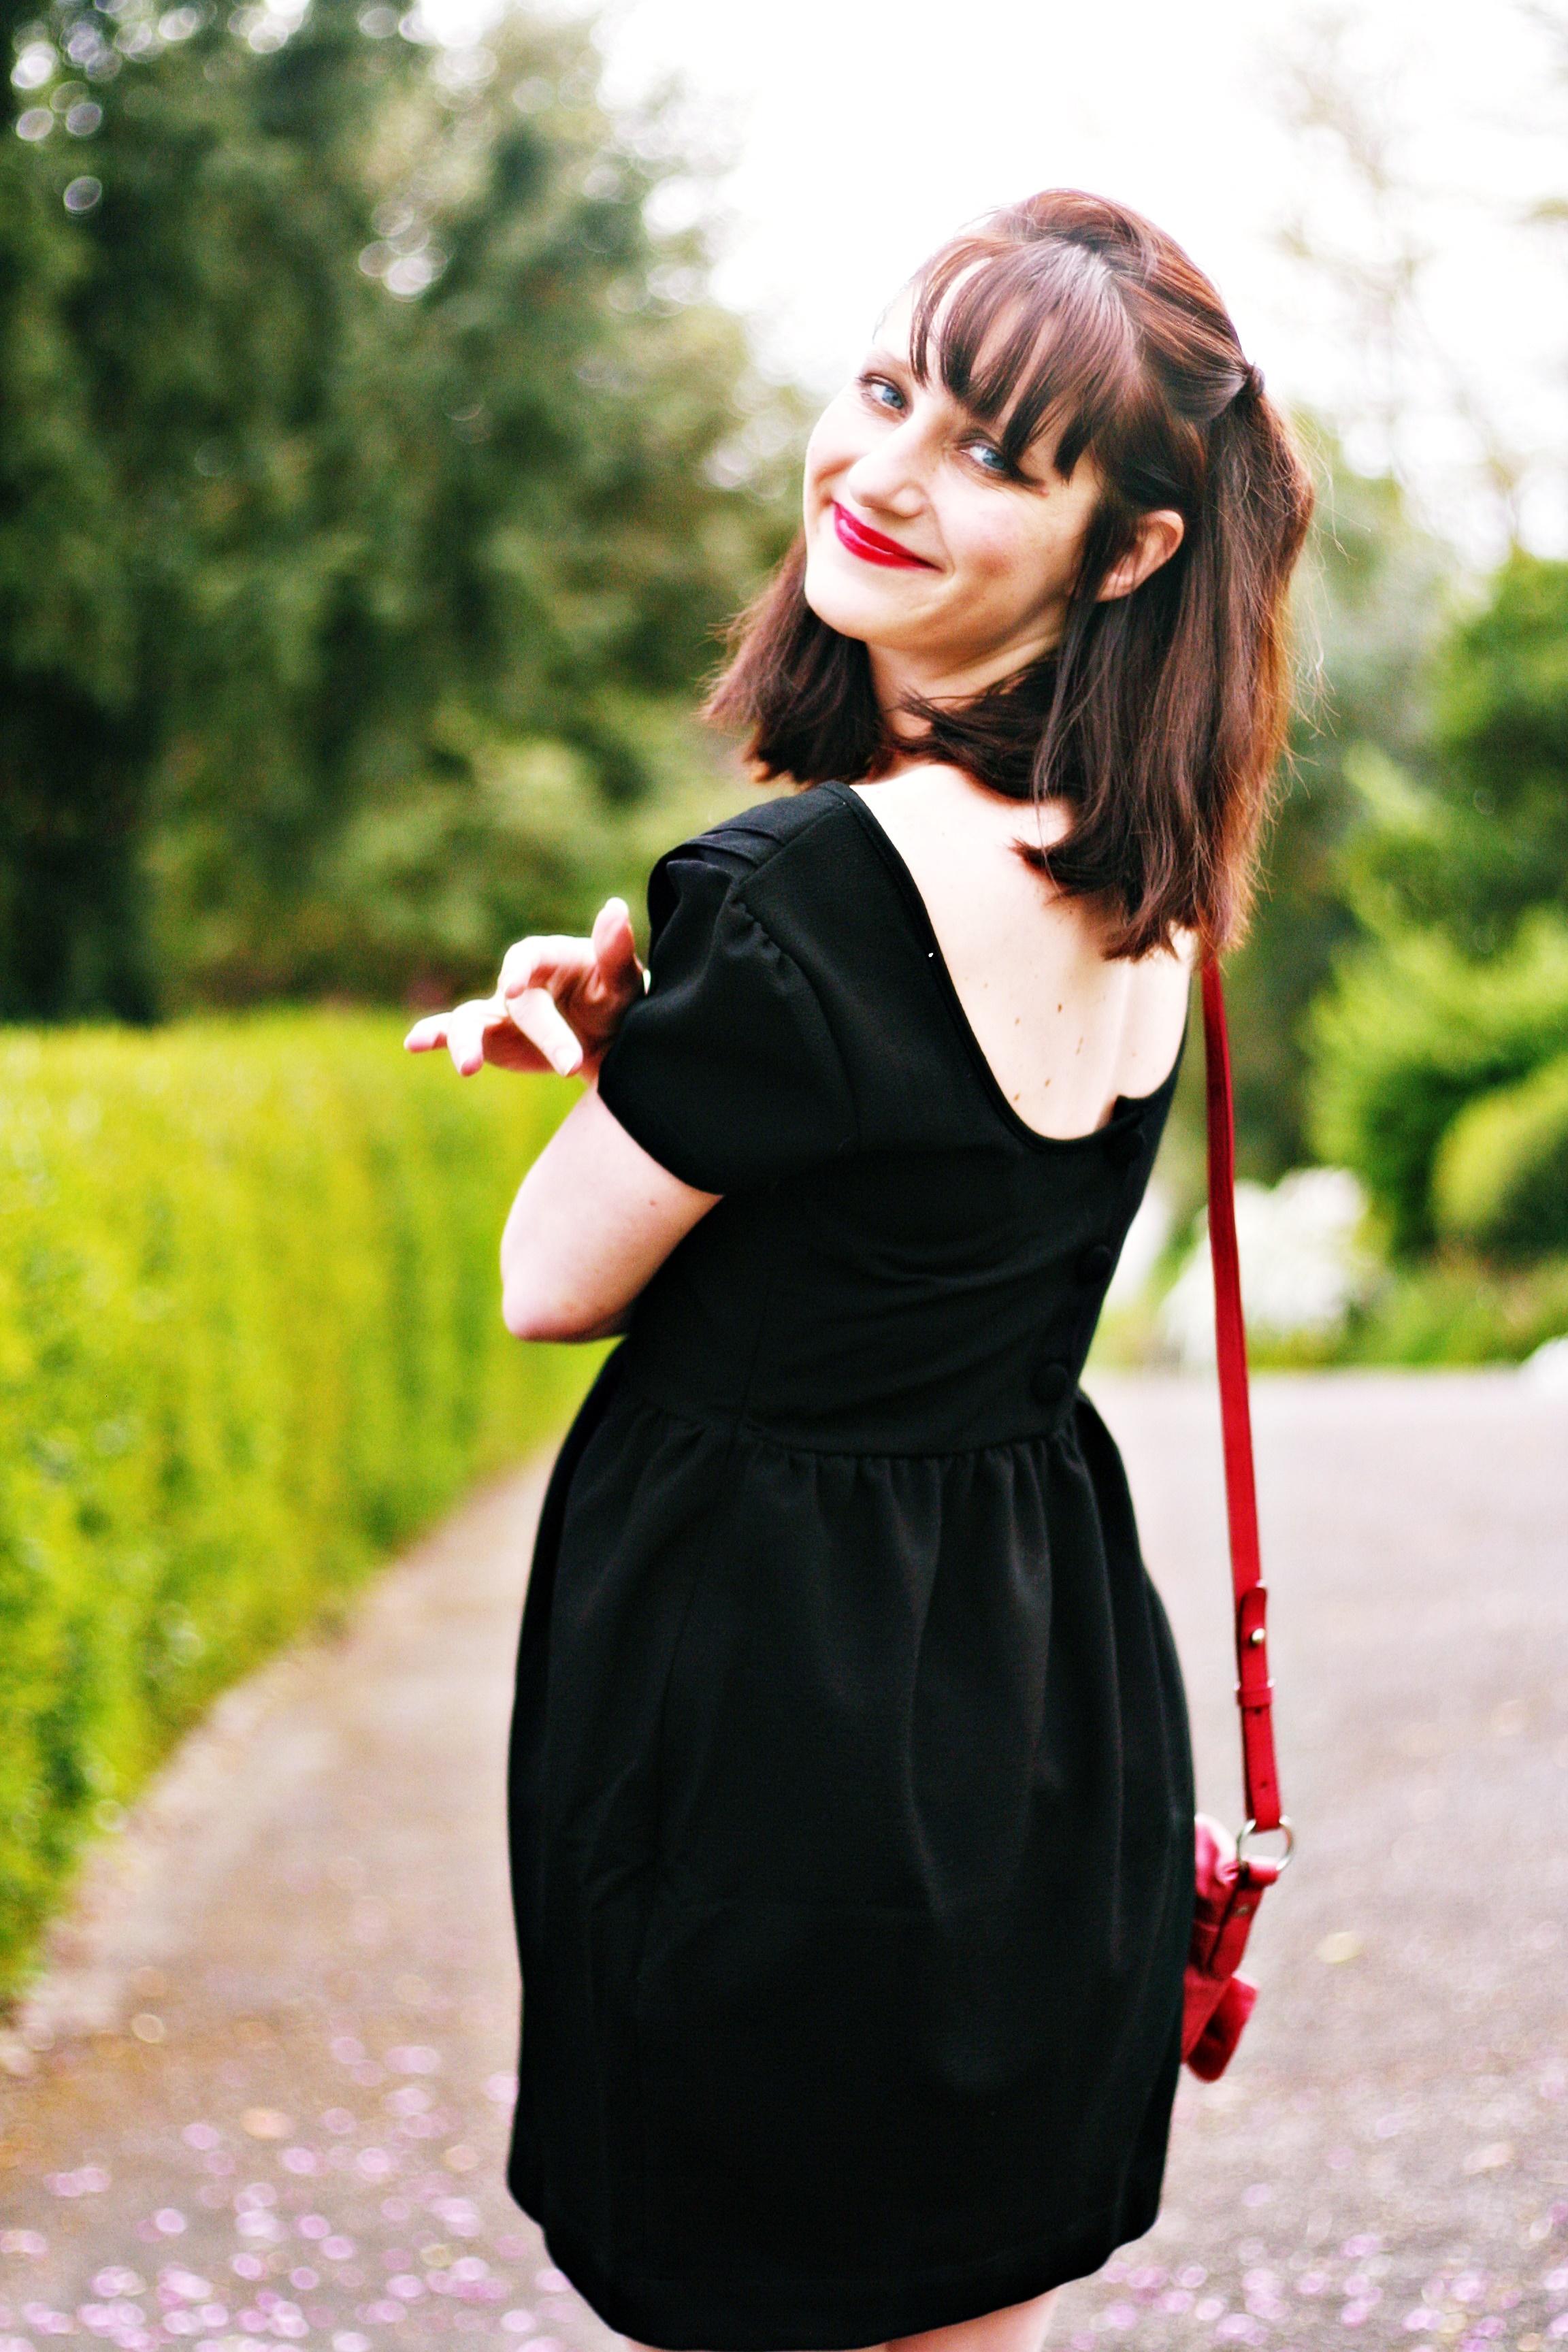 robe-noire-dos-boutonné-rond-black-dress-street-style-blog-mode-bymonshowroom-robe-noire-rétro